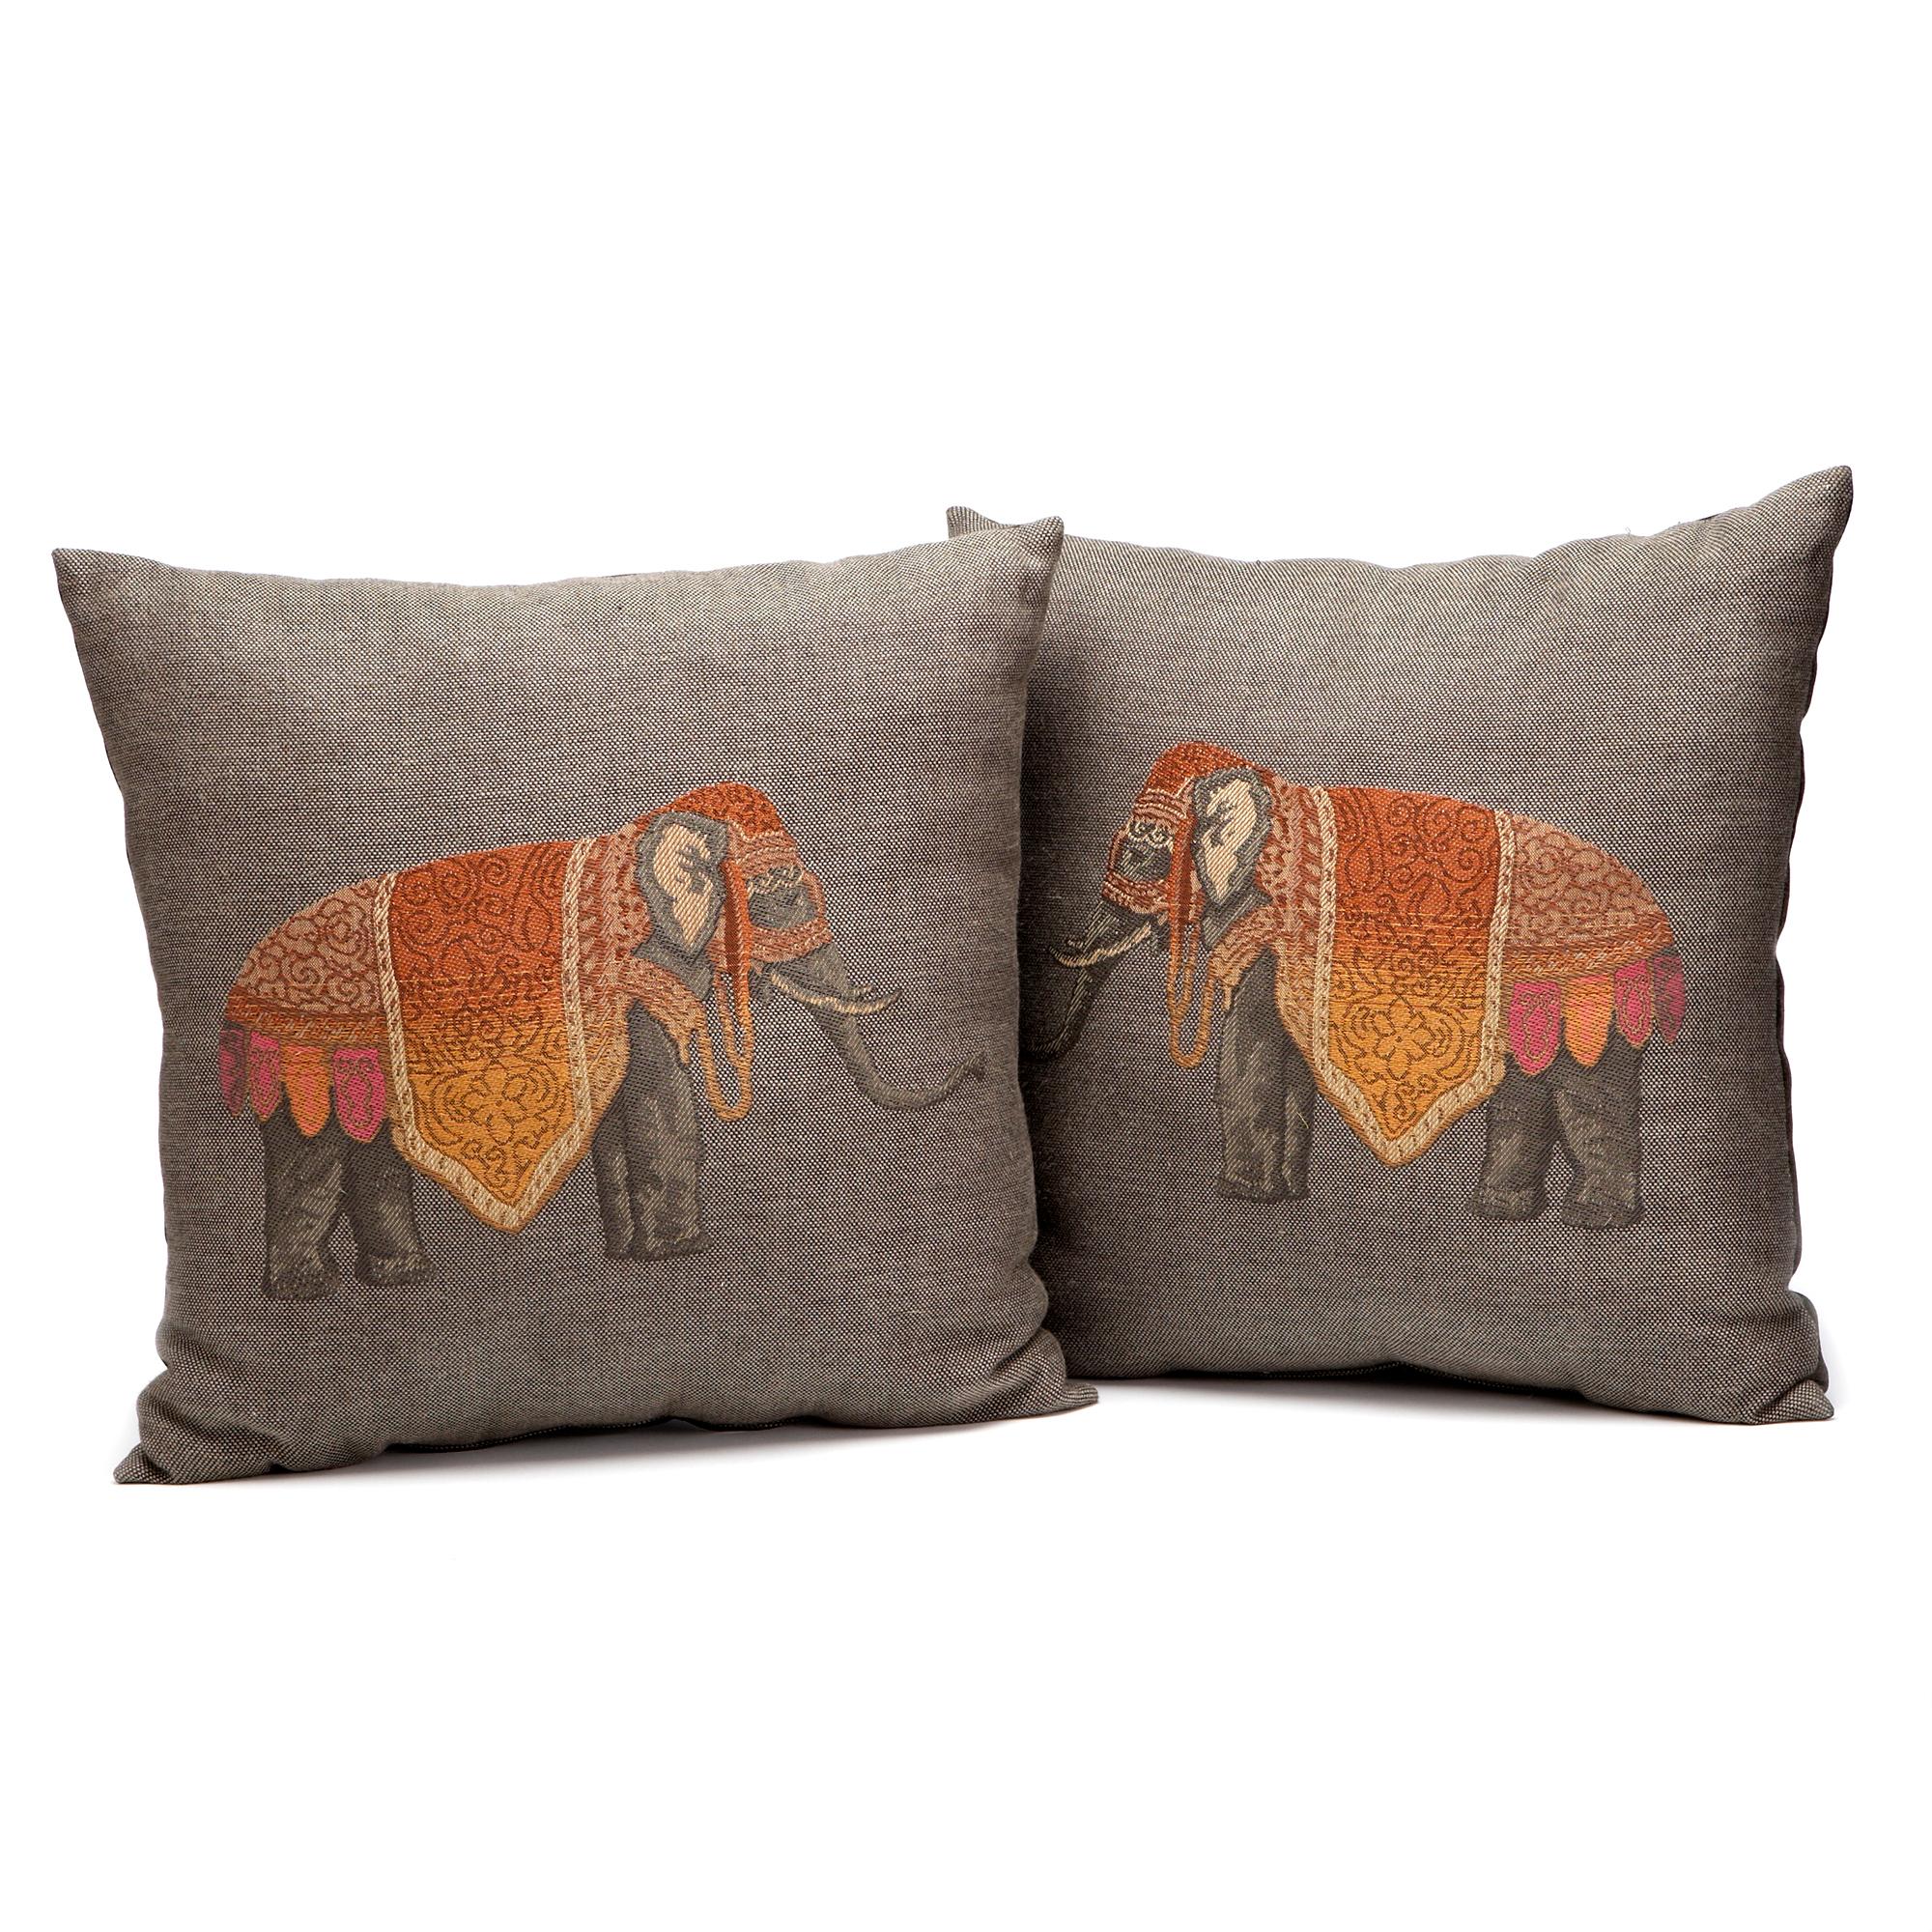 Throw Pillows Home : Raj Elephant Pillows Gump s